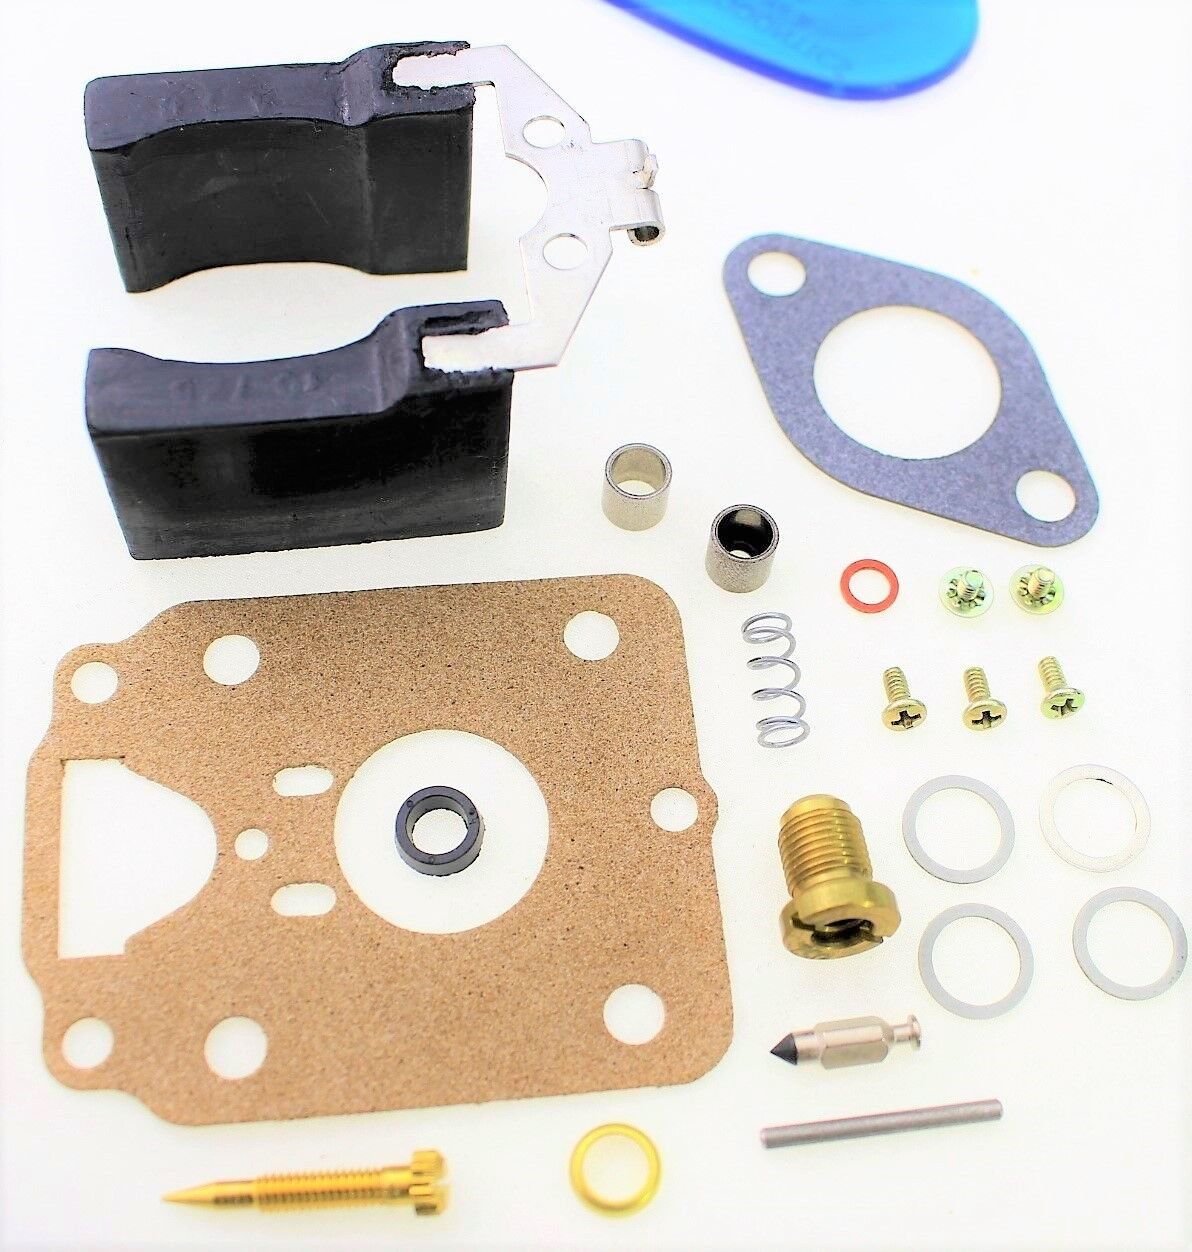 Carburetor Kit Float Fits Marvel Schebler Vo Vd Some Onan Ck Cck Zenith Ford 2000 Tractor Norton Secured Powered By Verisign